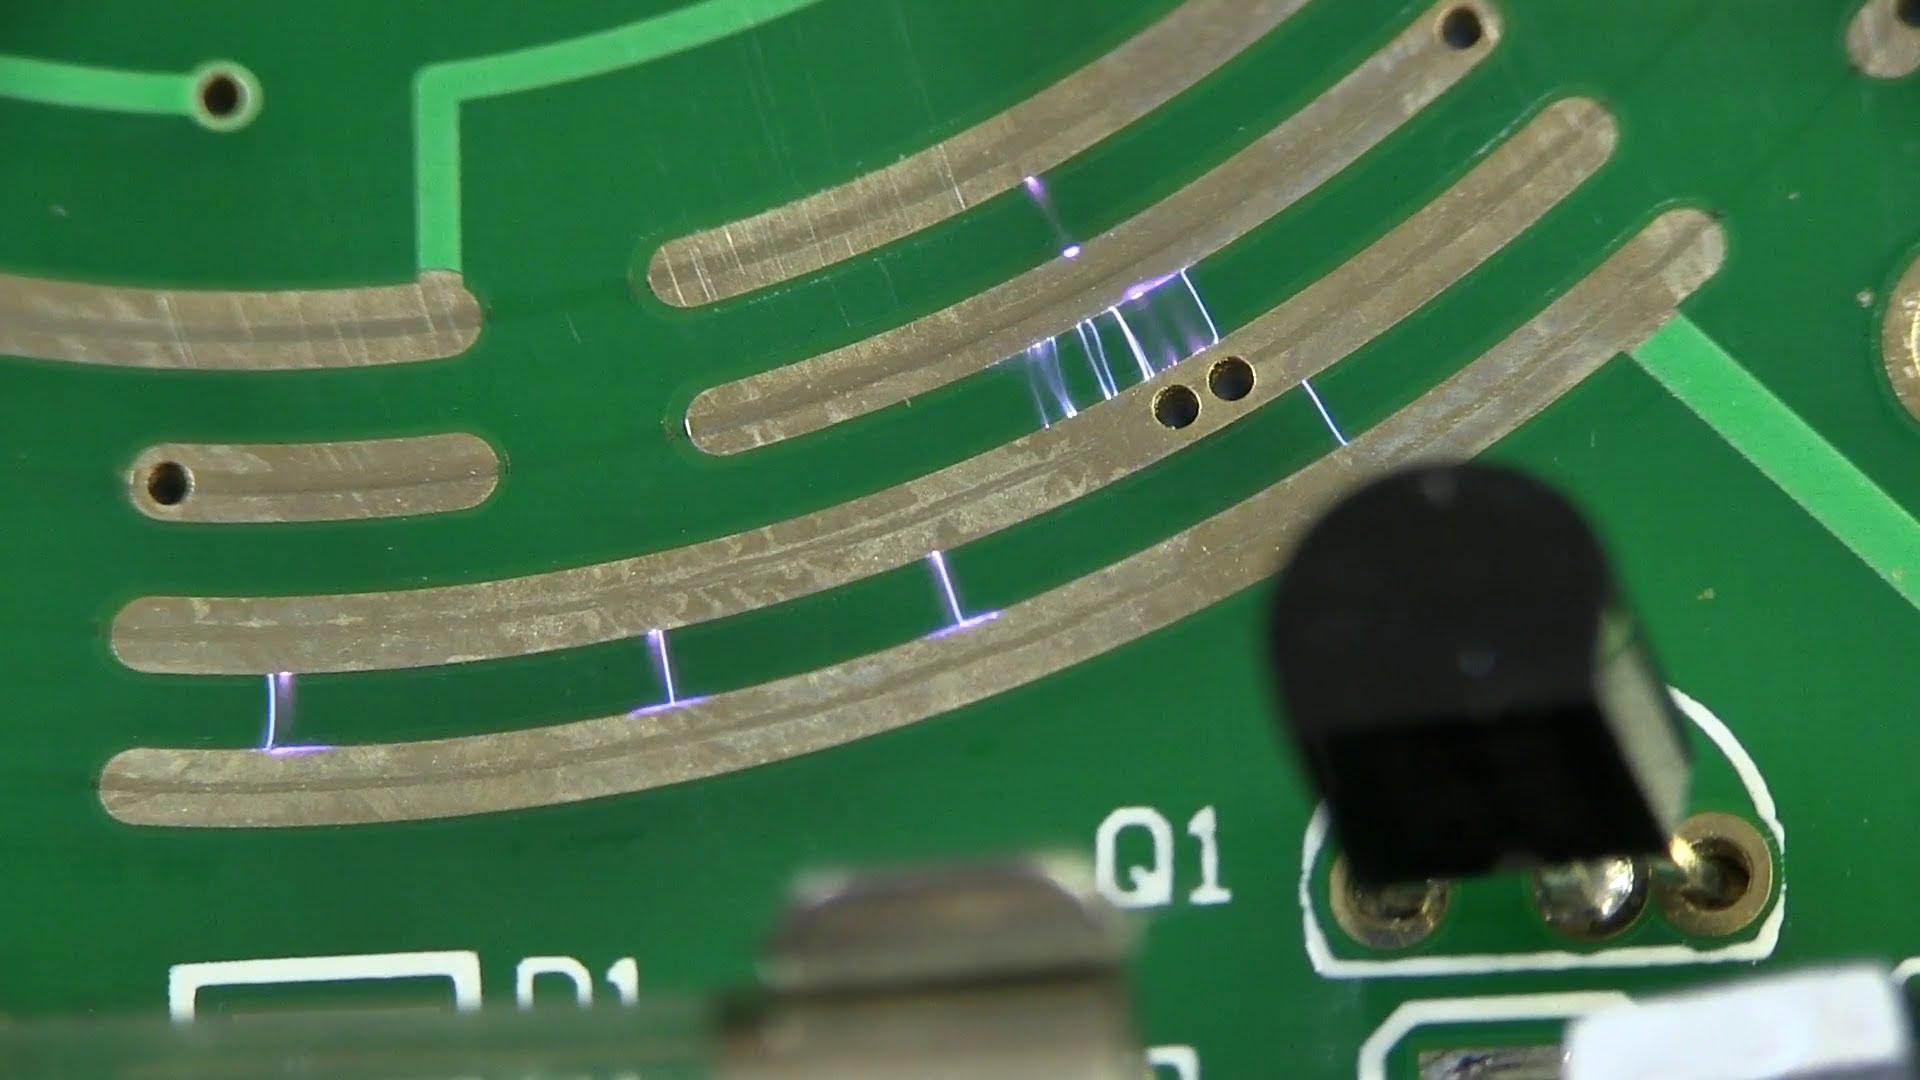 EEVblog #468 – Uni-T UT513 Insulation Resistance Meter Teardown